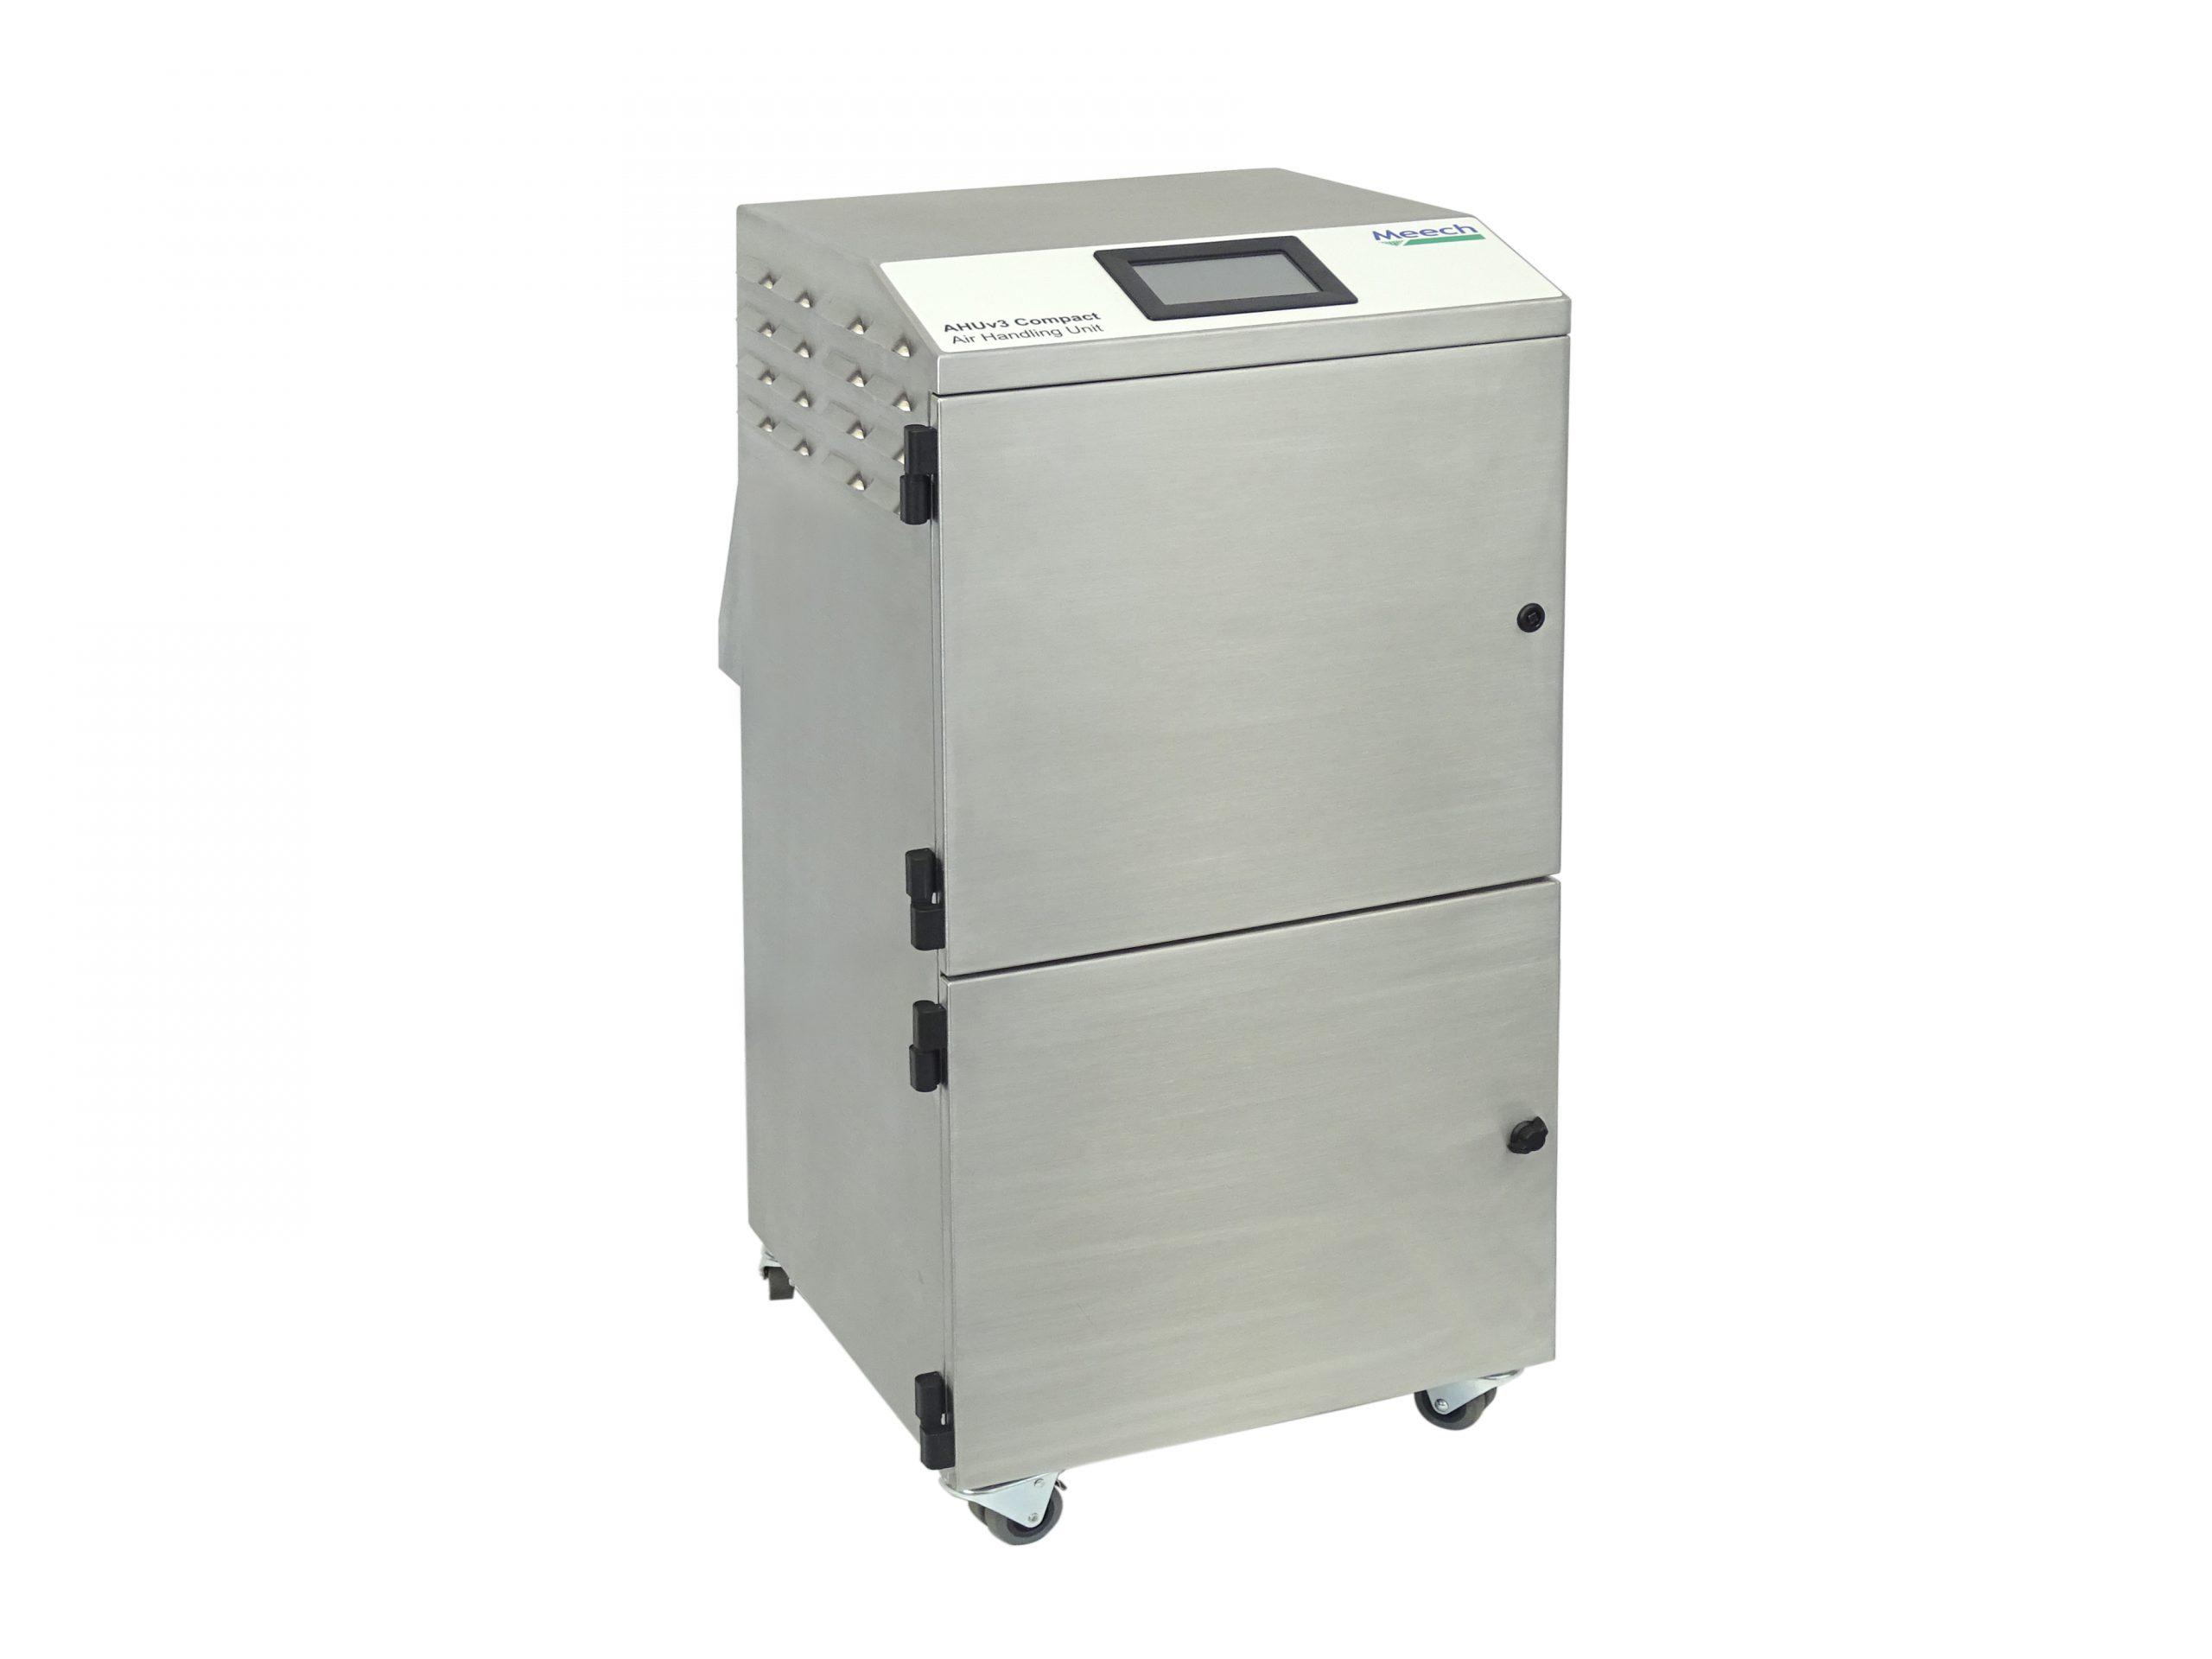 AHUv3 Compact - 2 Pompa